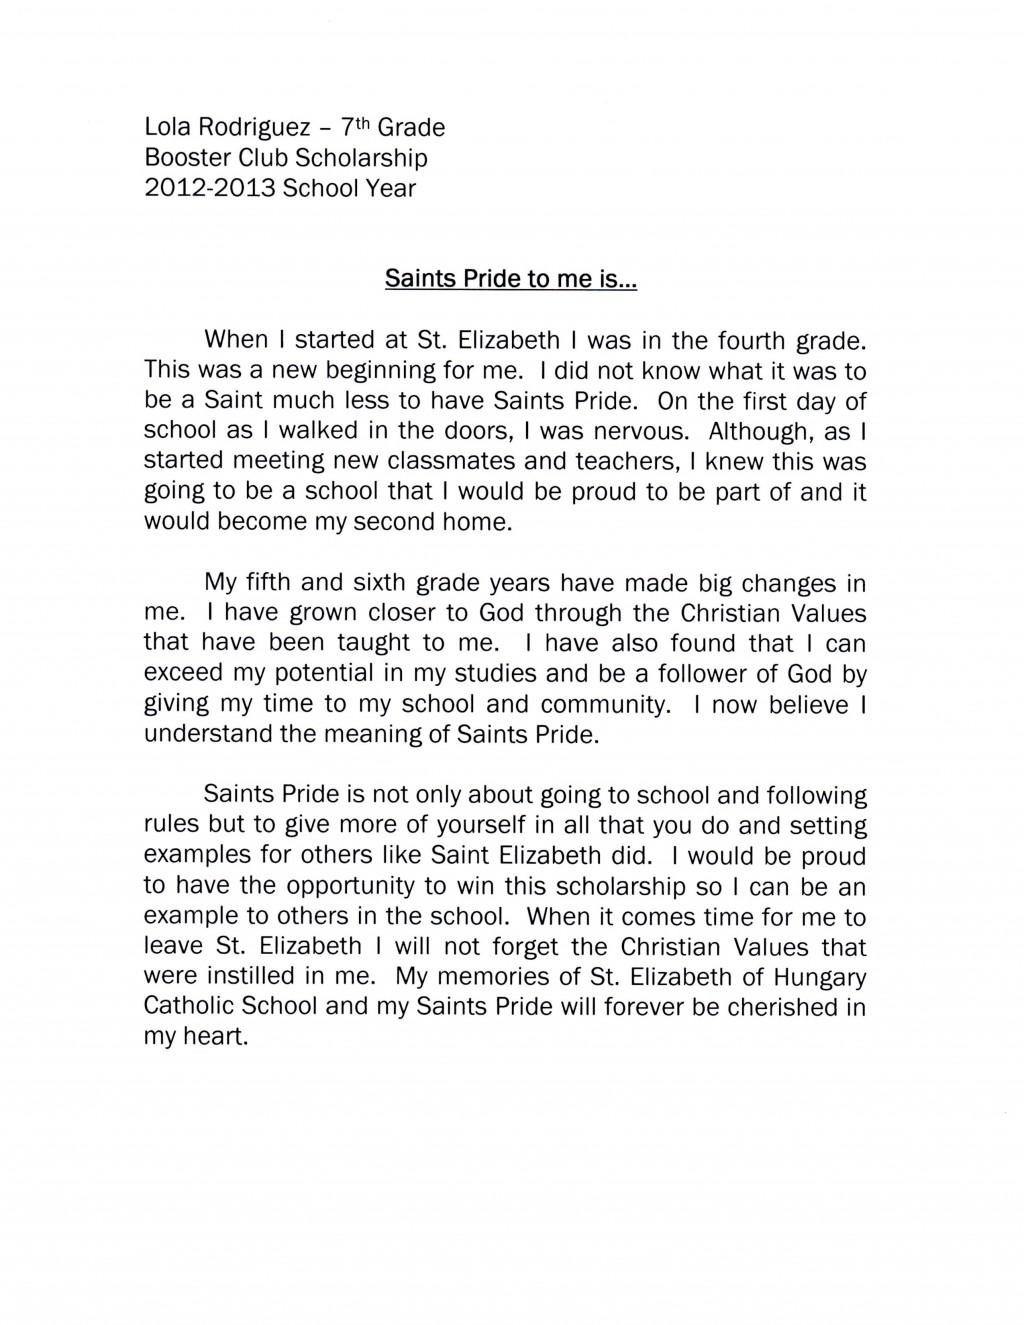 002 Essay Example Lola Rodriguez I Need Help Writing Stunning An Evaluation For Free Large